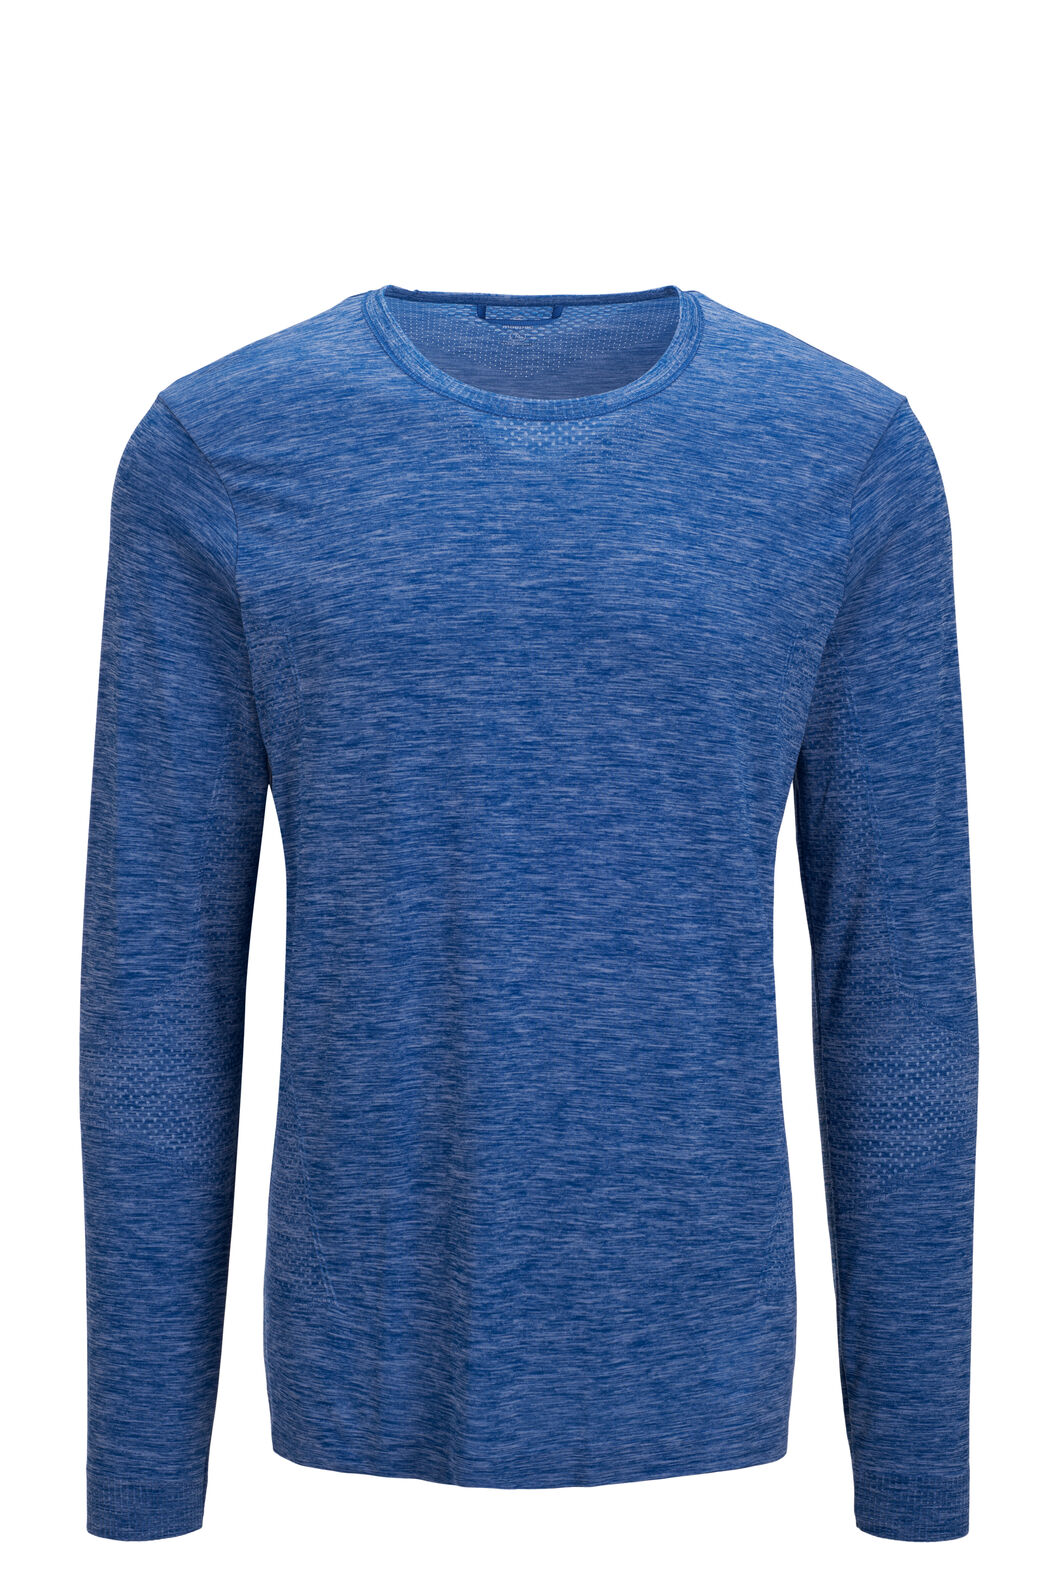 Macpac Limitless Long Sleeve Tee — Men's, Classic Blue, hi-res